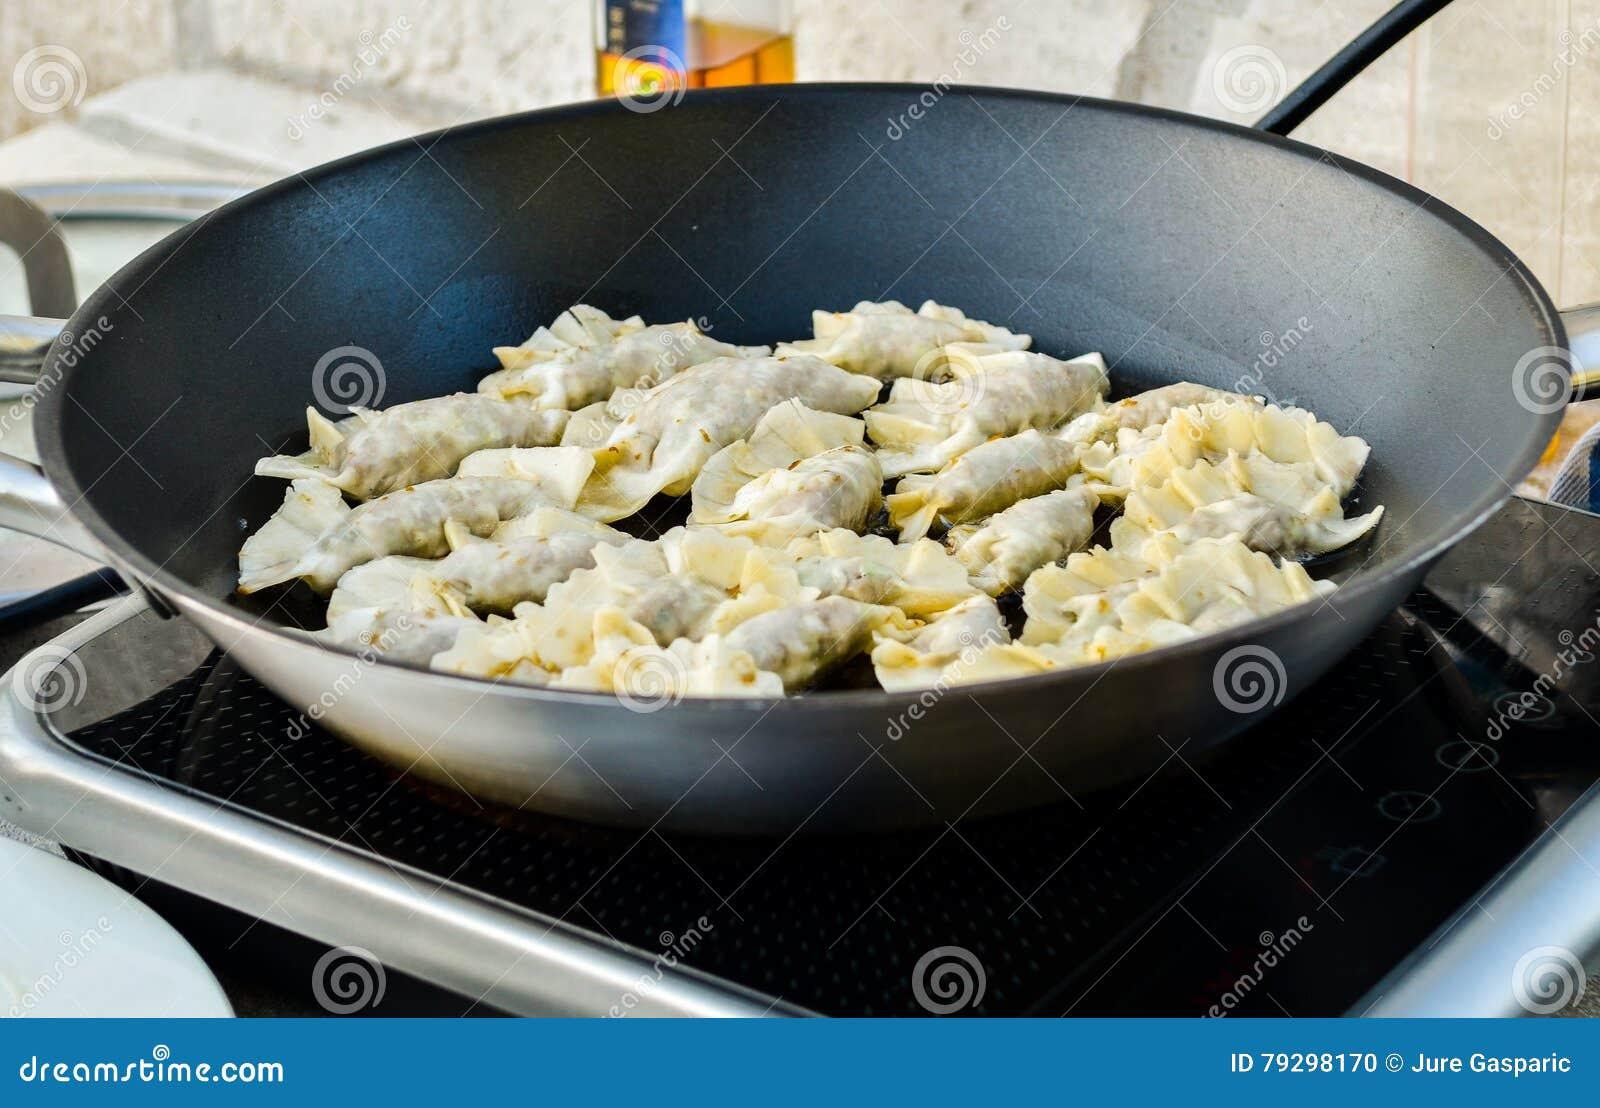 making homemade gyoza japanese dumplings in frying pan stock